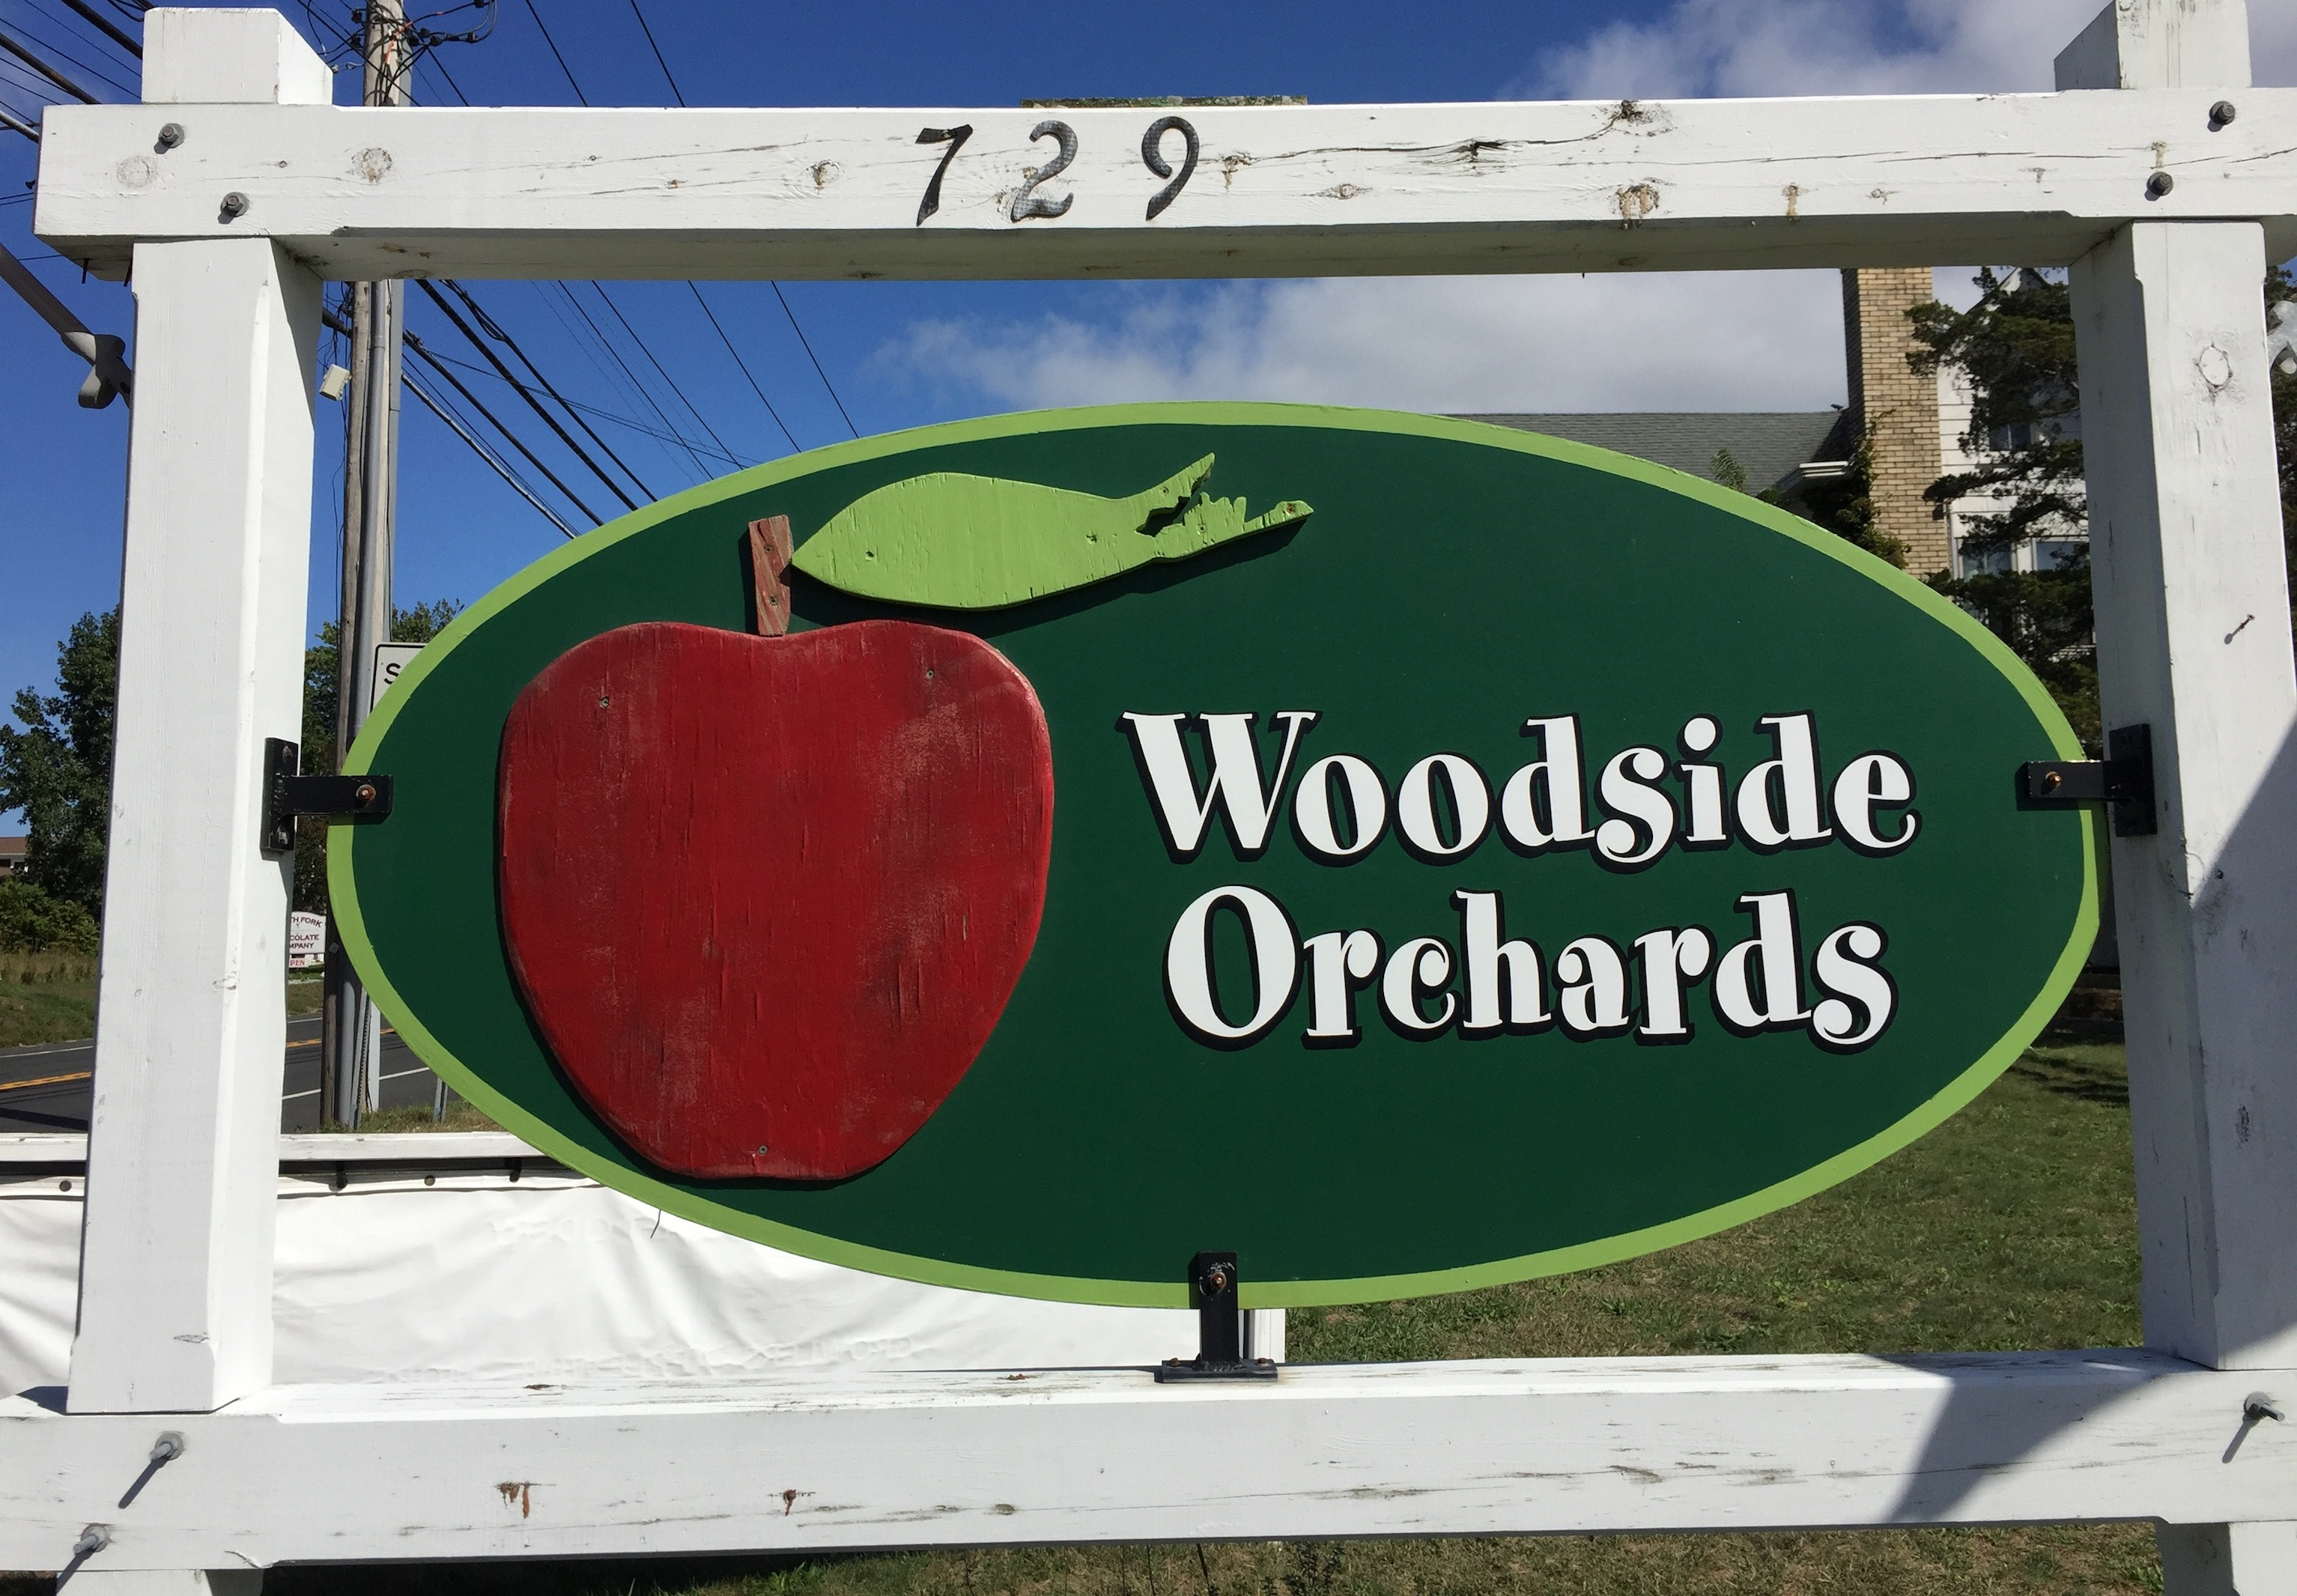 woodside orchards